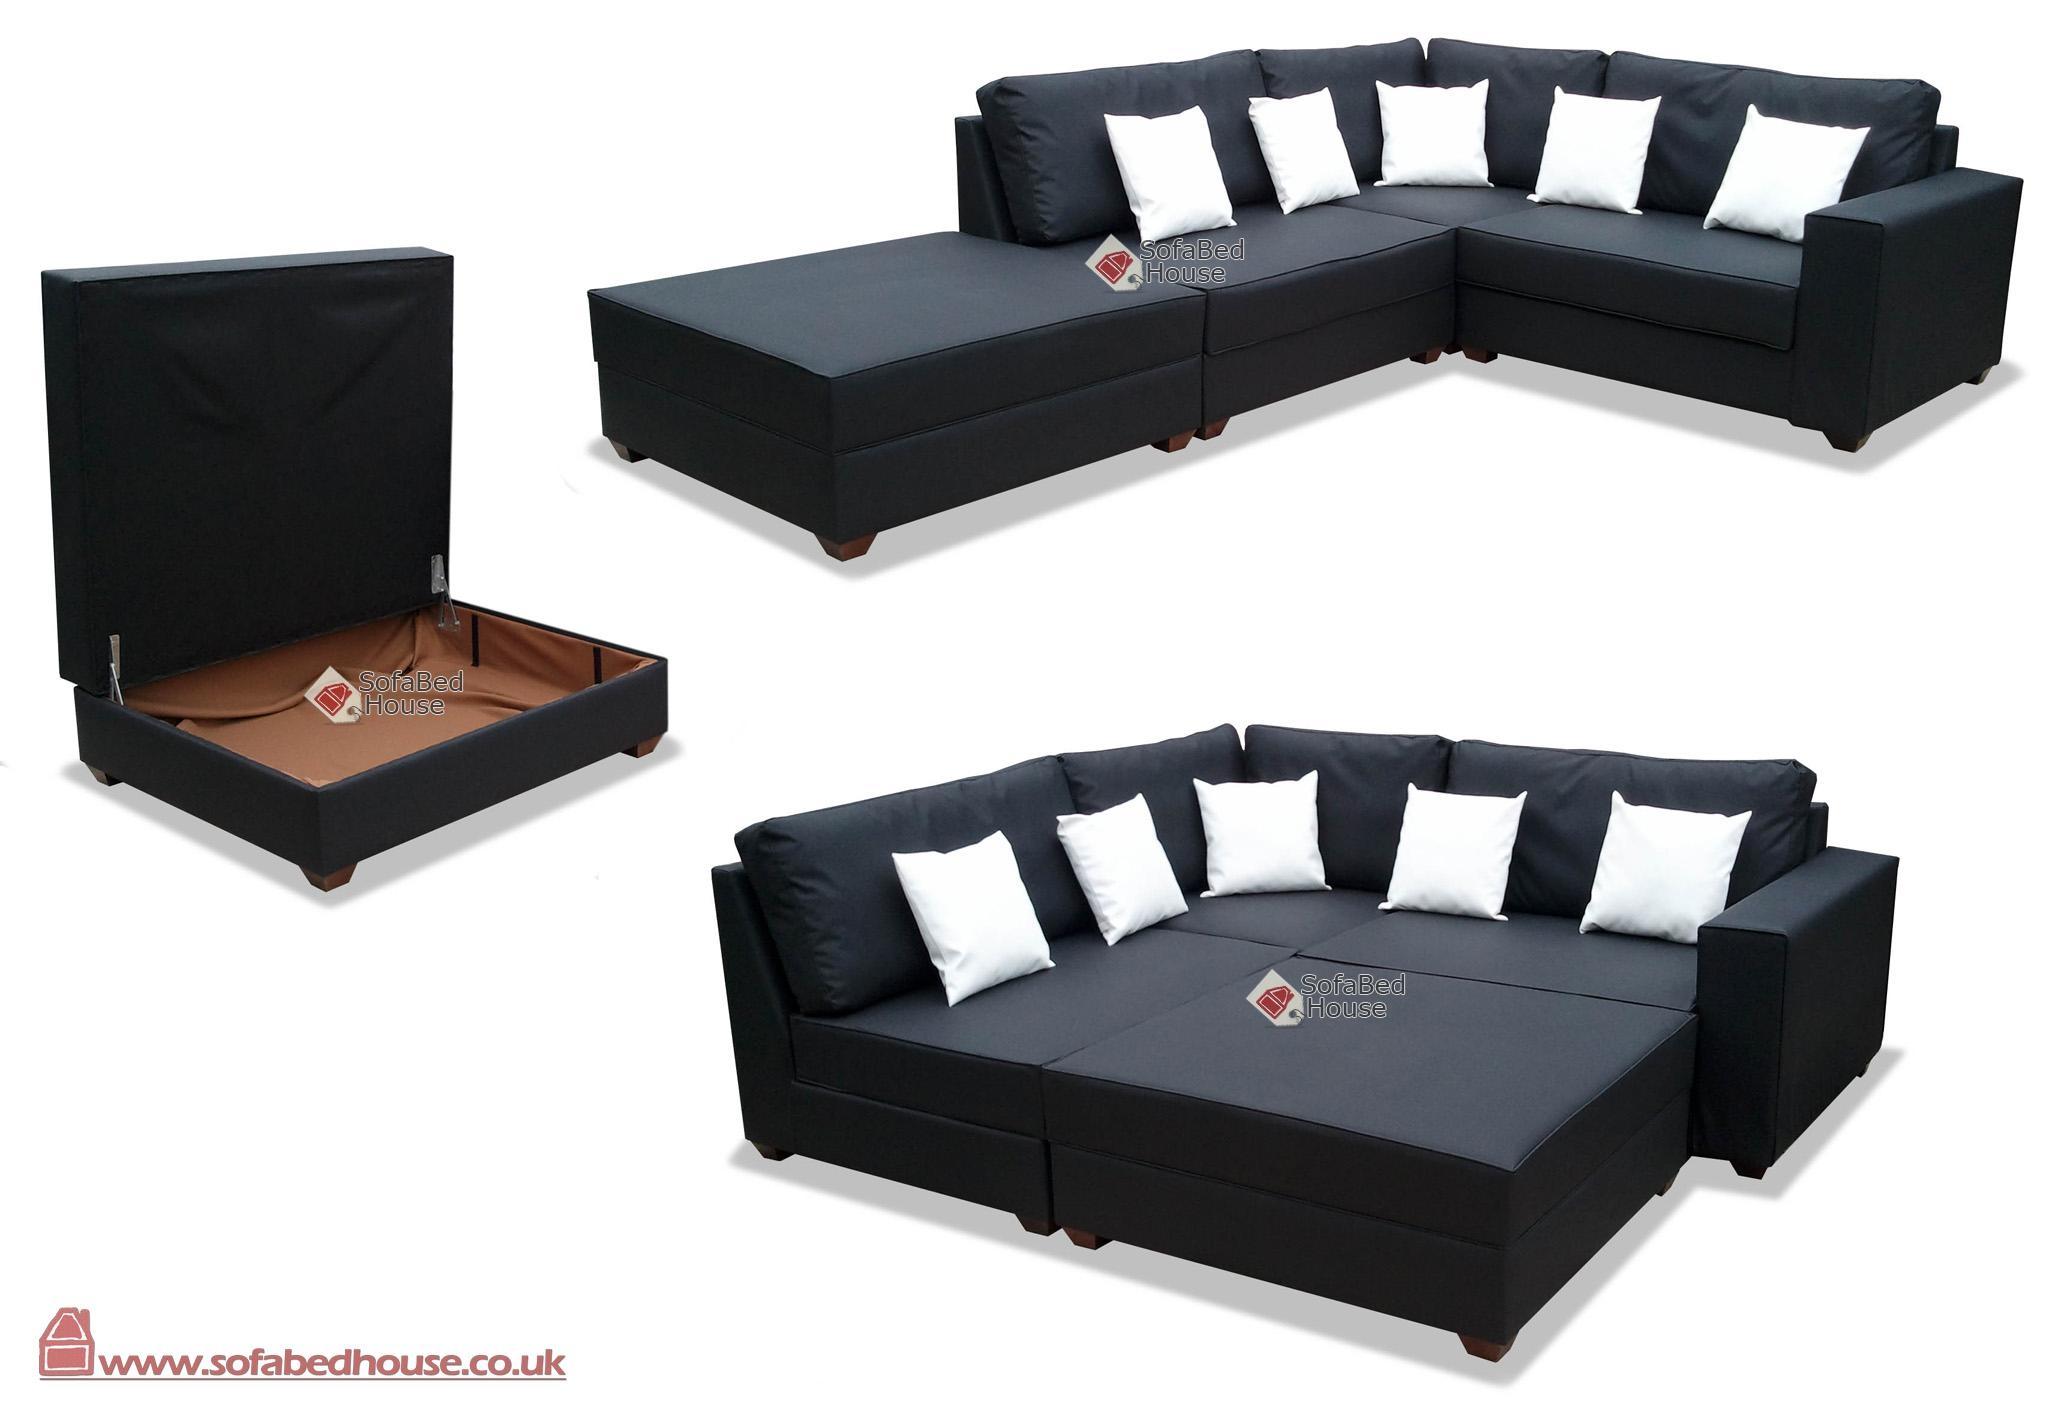 cheapest sofas online uk white wicker indoor sofa 20 best cheap corner beds ideas